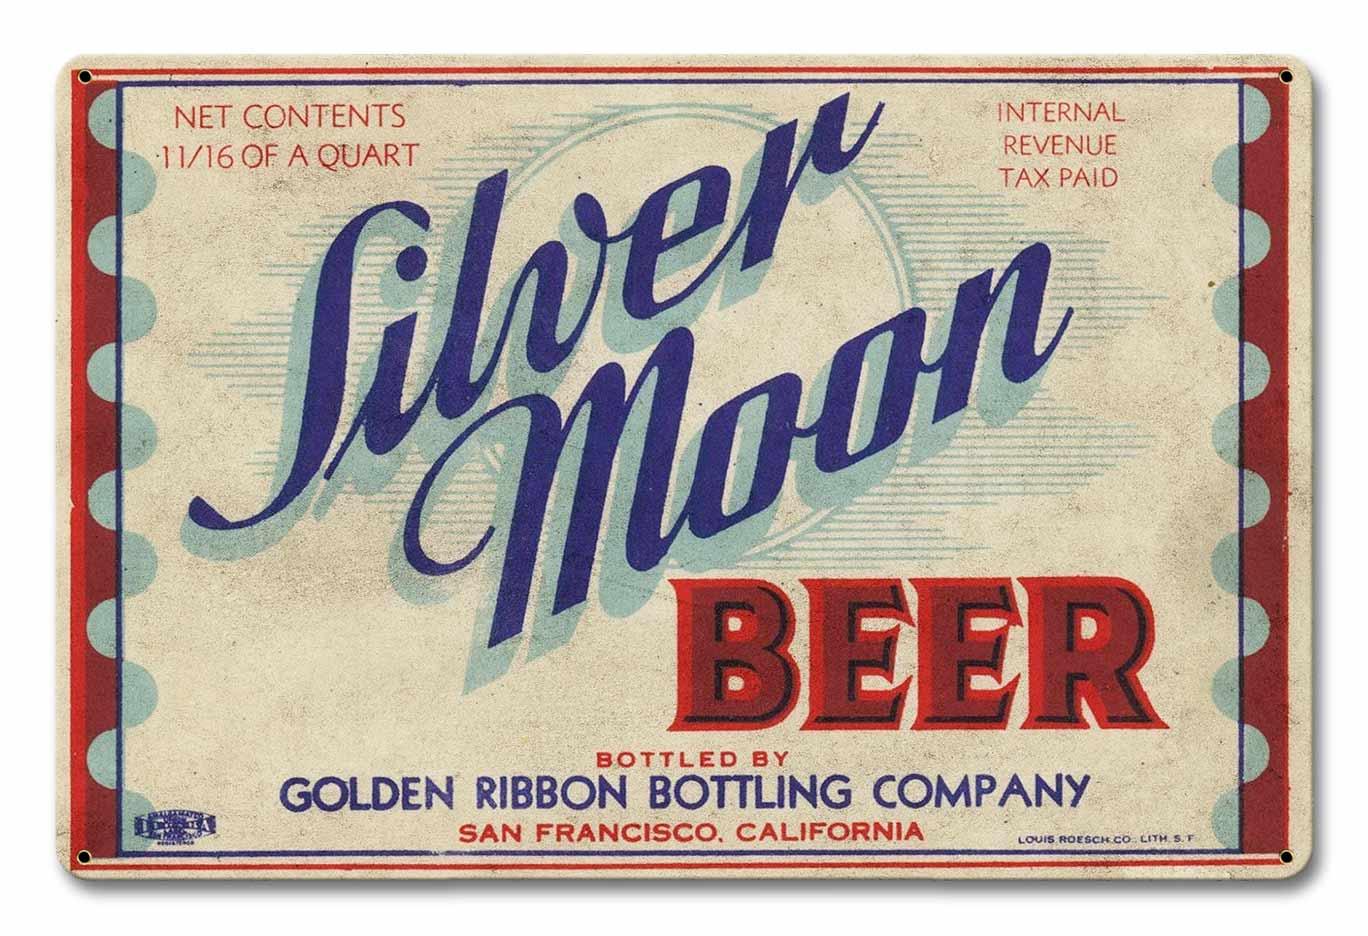 Silver Moon Beer